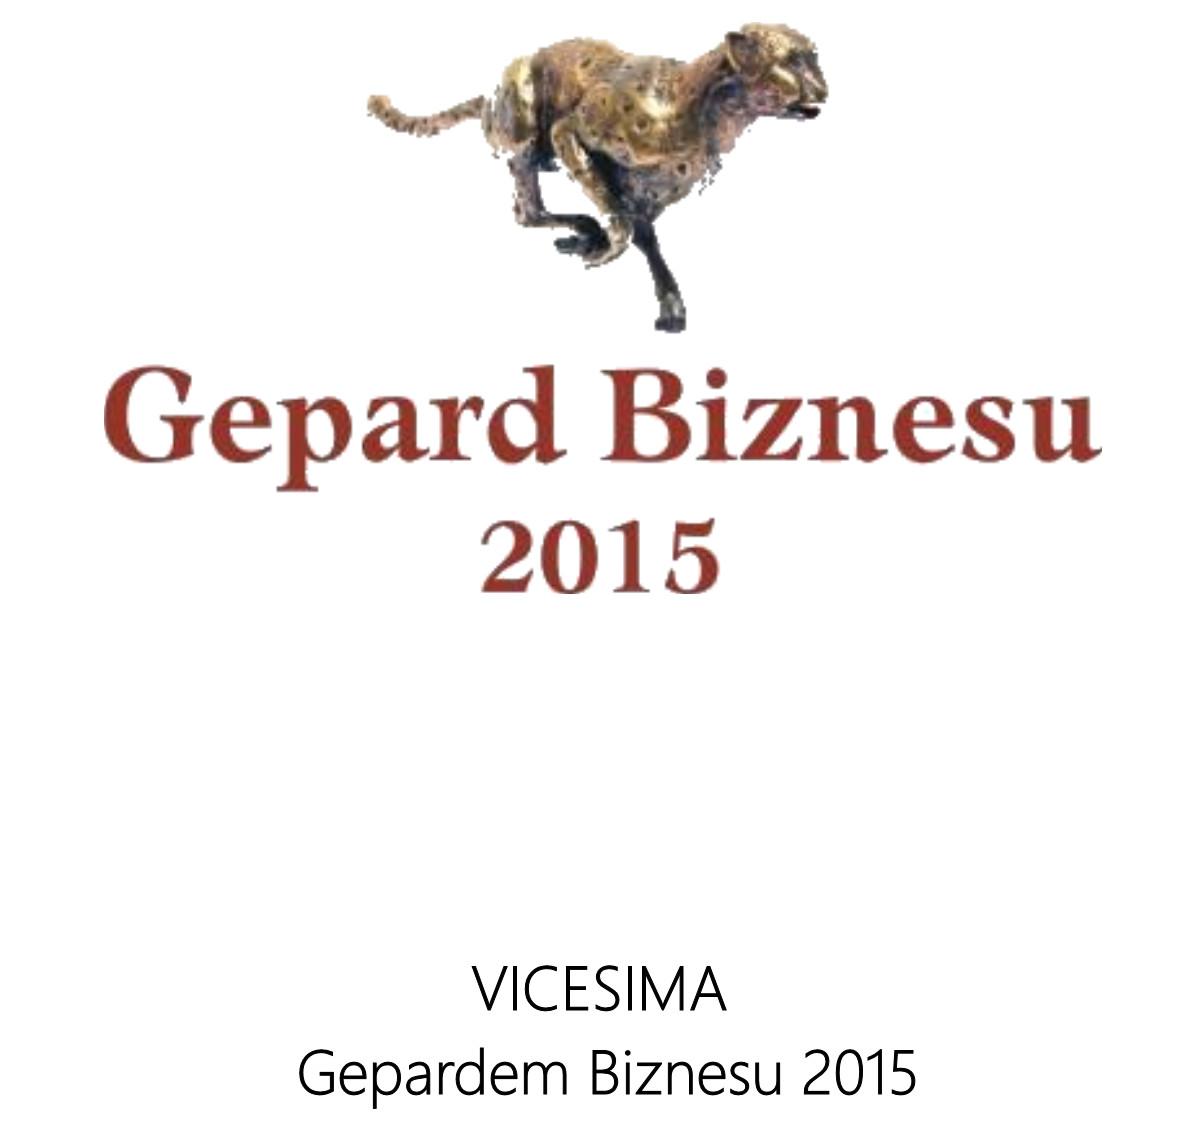 Gepard Biznesu